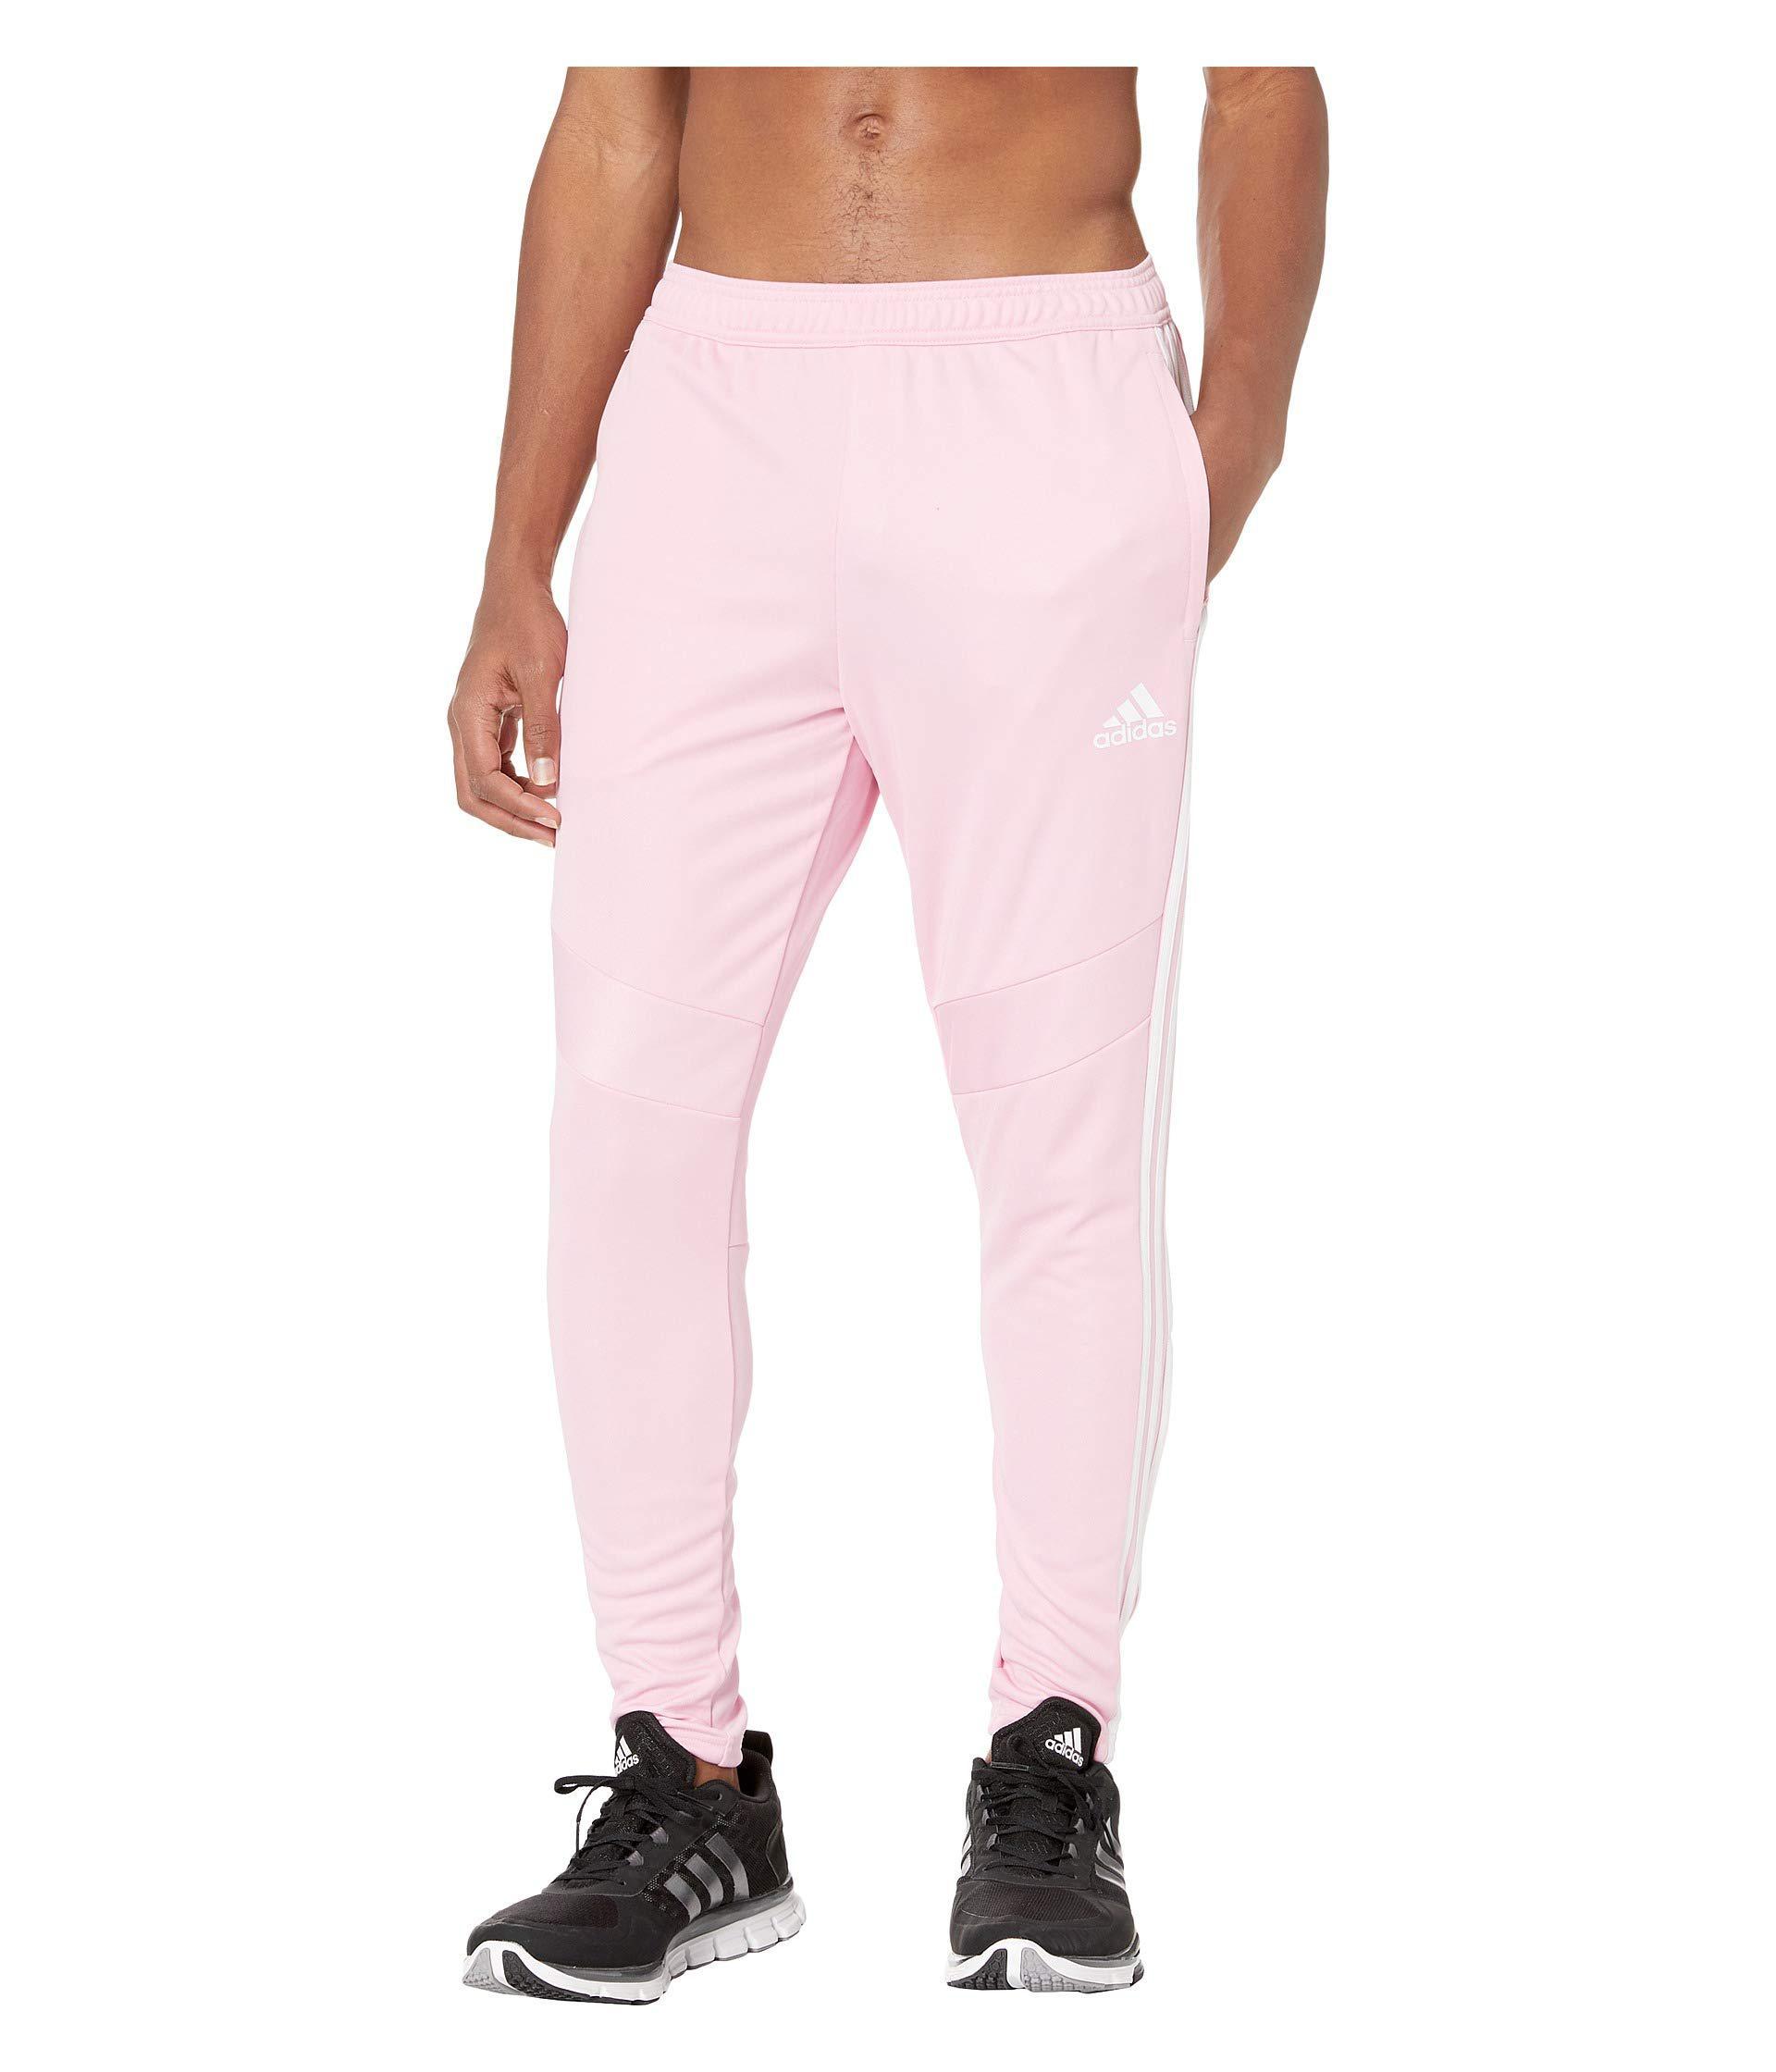 Lyst - adidas Tiro  19 Pants (dark Blue white) Men s Workout in Pink ... 939d4c808aa09